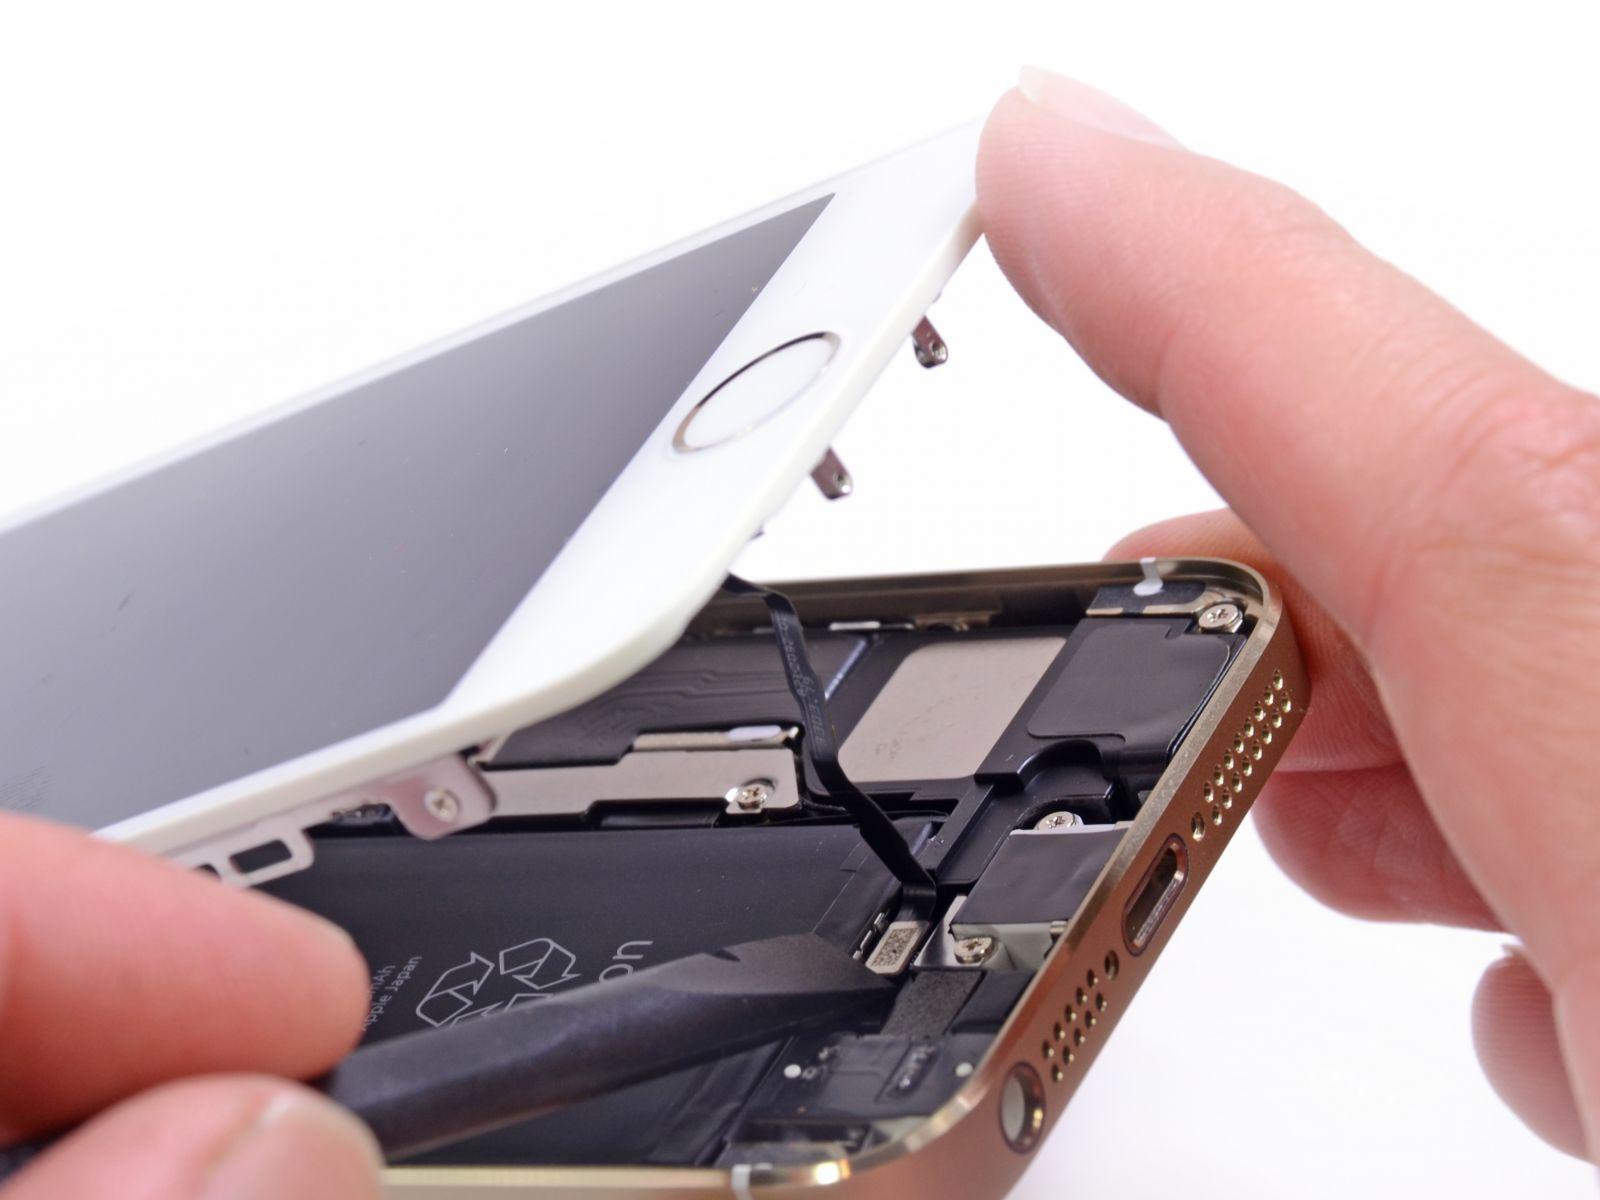 kak-razobrat-iphone-5s-13